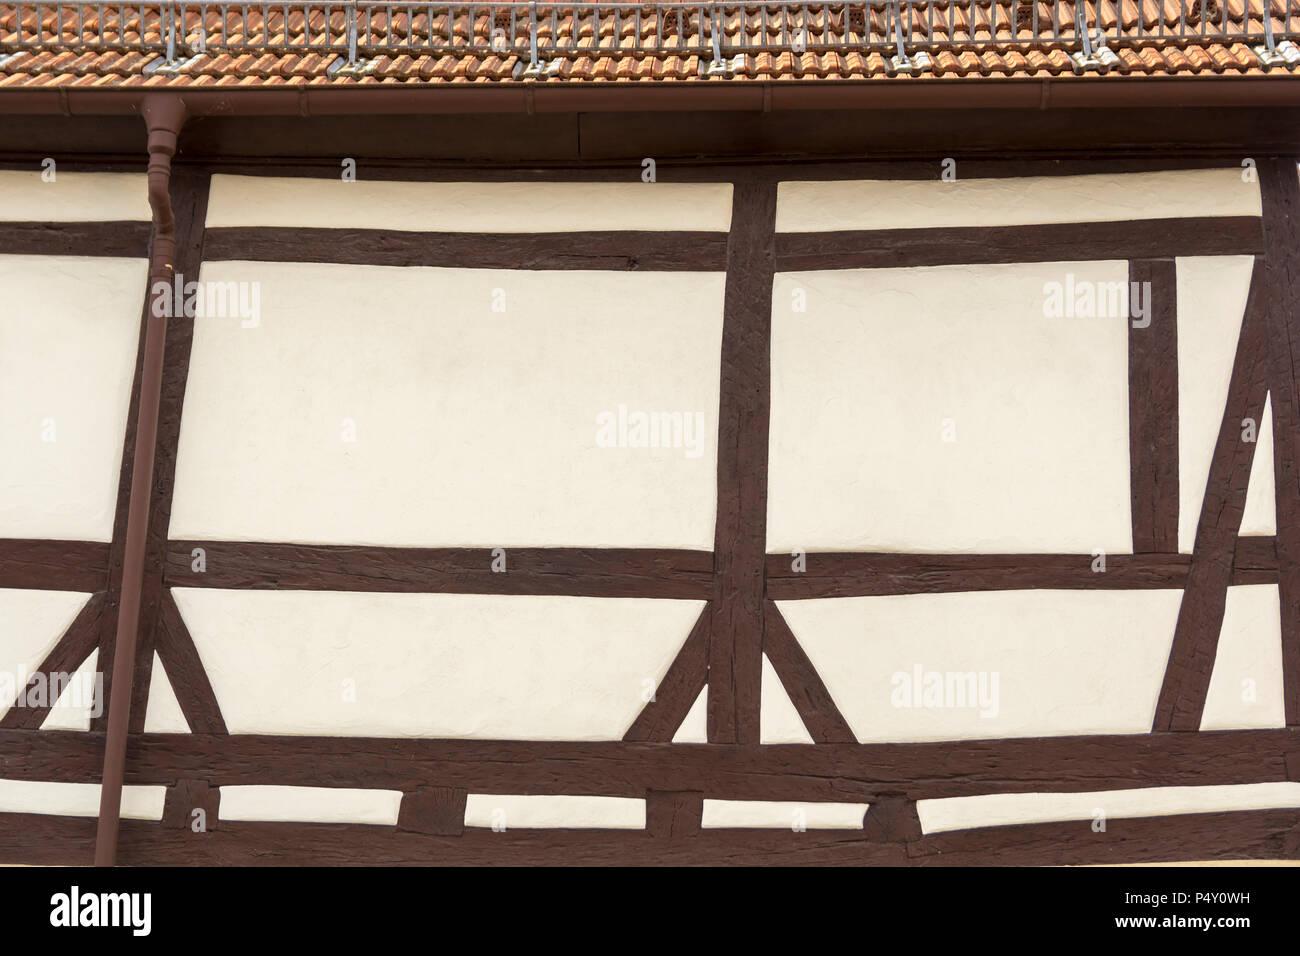 Großartig Dachstuhl Stile Galerie - Rahmen Ideen - markjohnsonshow.info